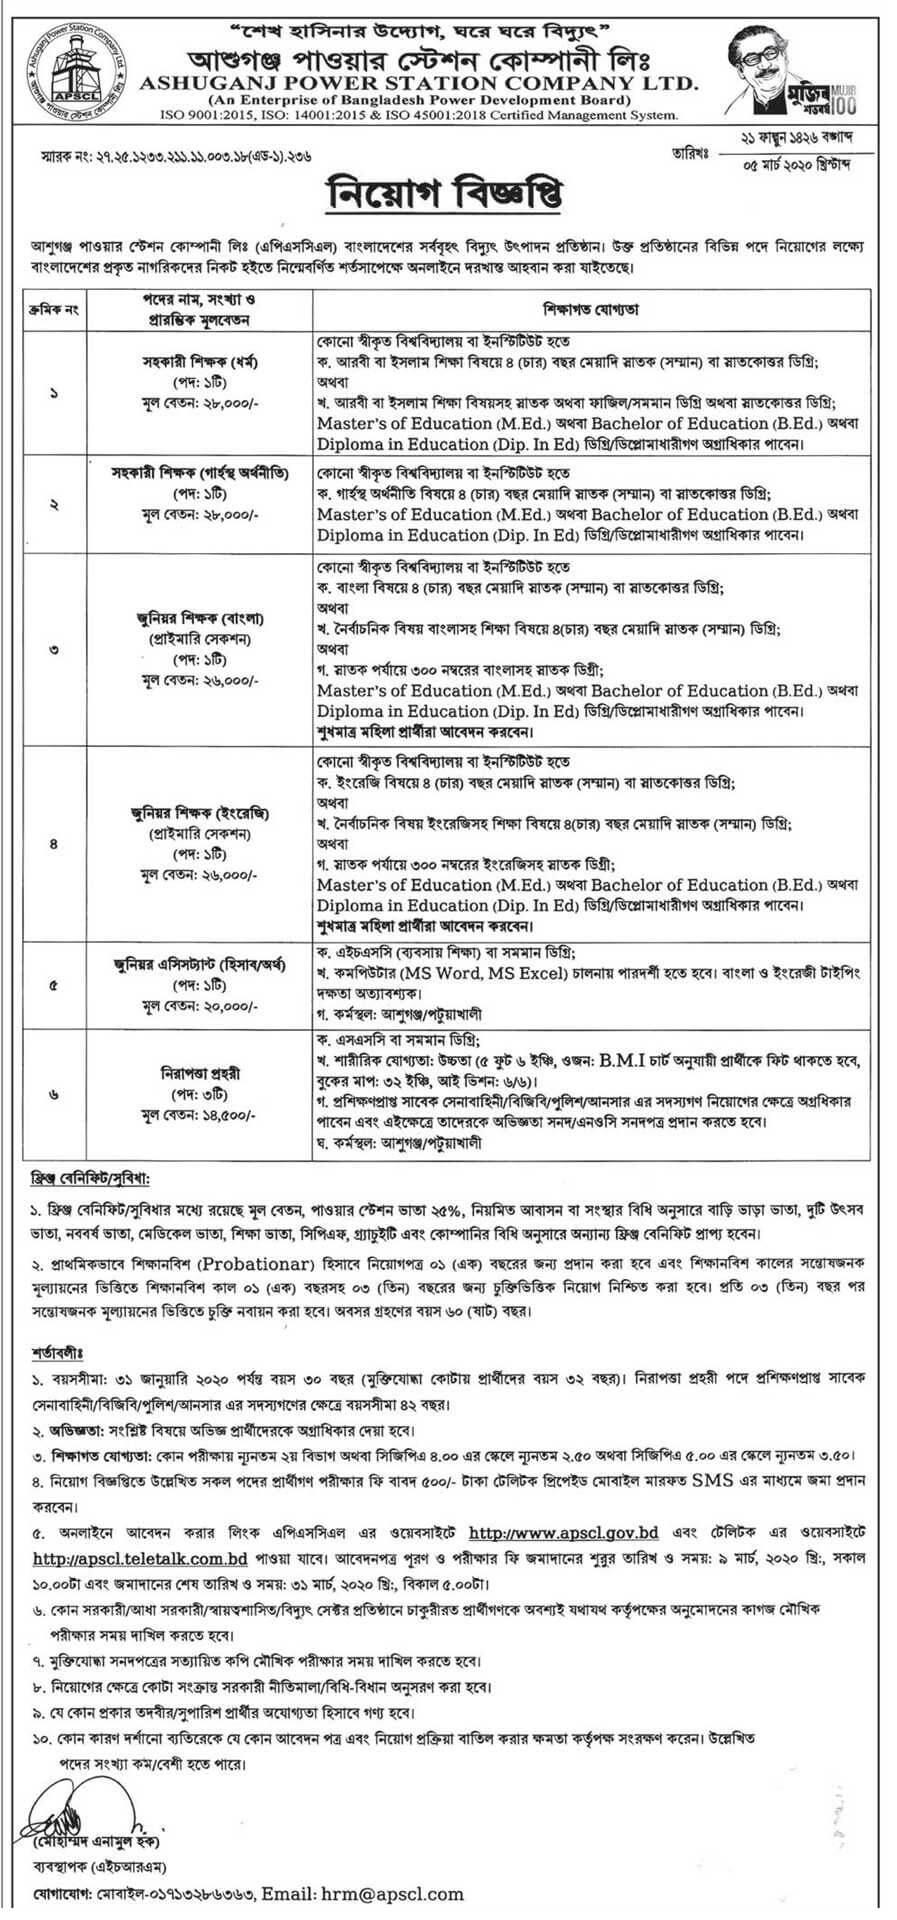 Ashuganj Power Station Limited Job Circular 2020